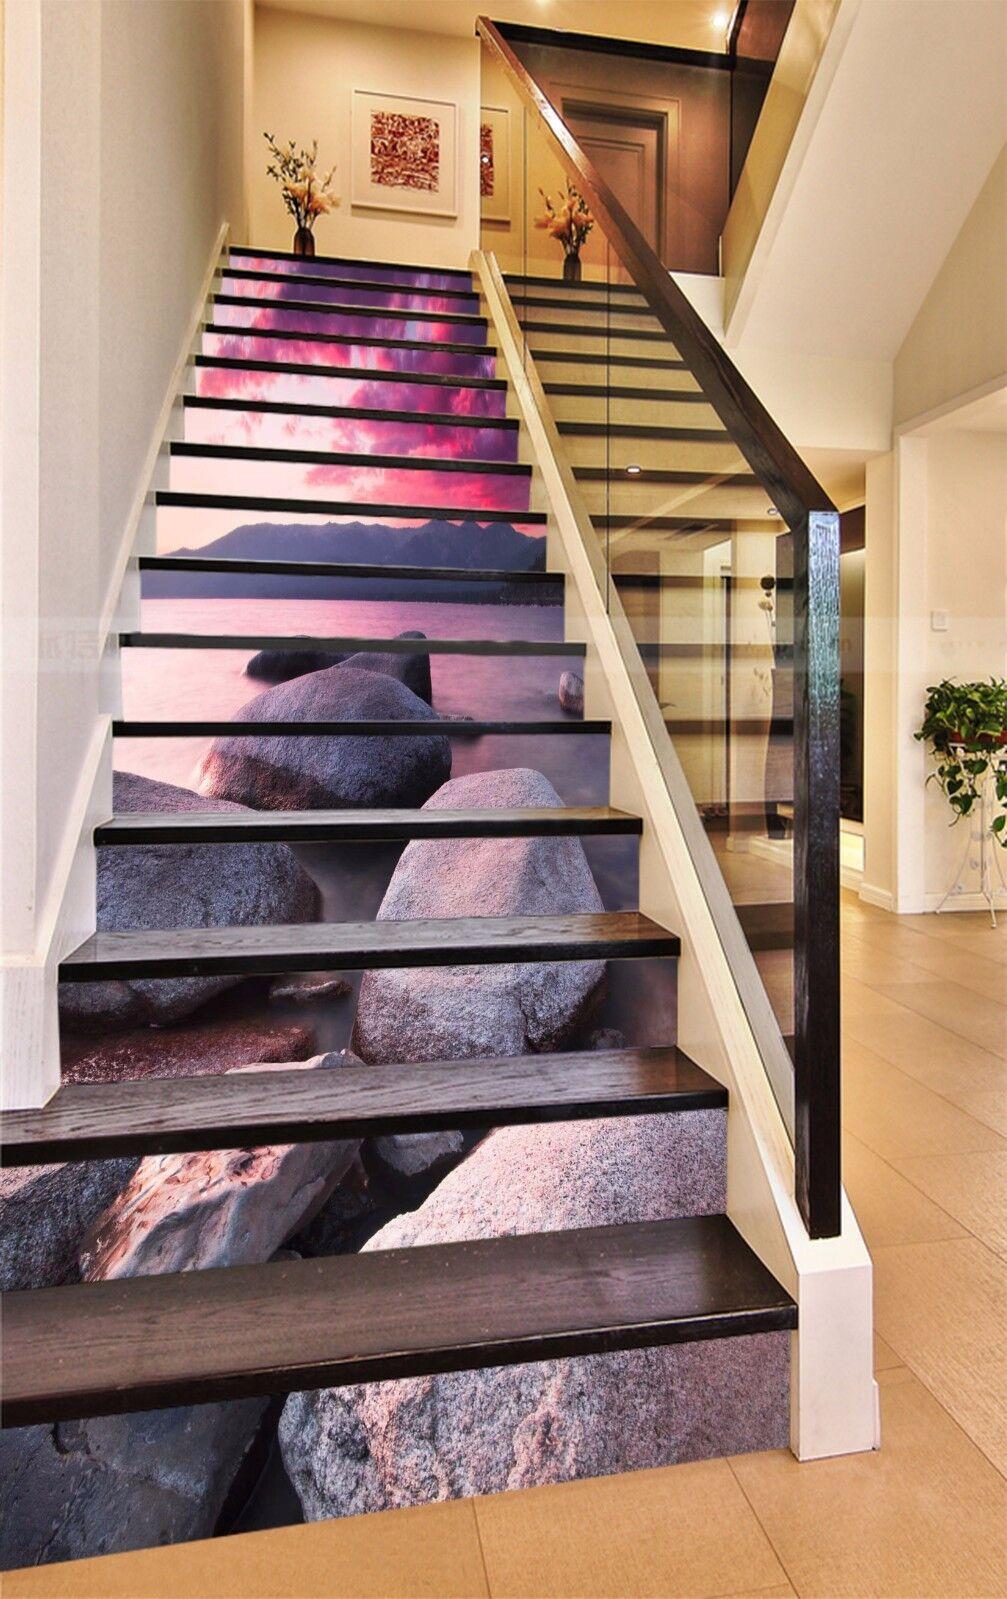 3D Stein Meer 7758 Stair Risers Dekoration Fototapete Vinyl Aufkleber Tapete DE